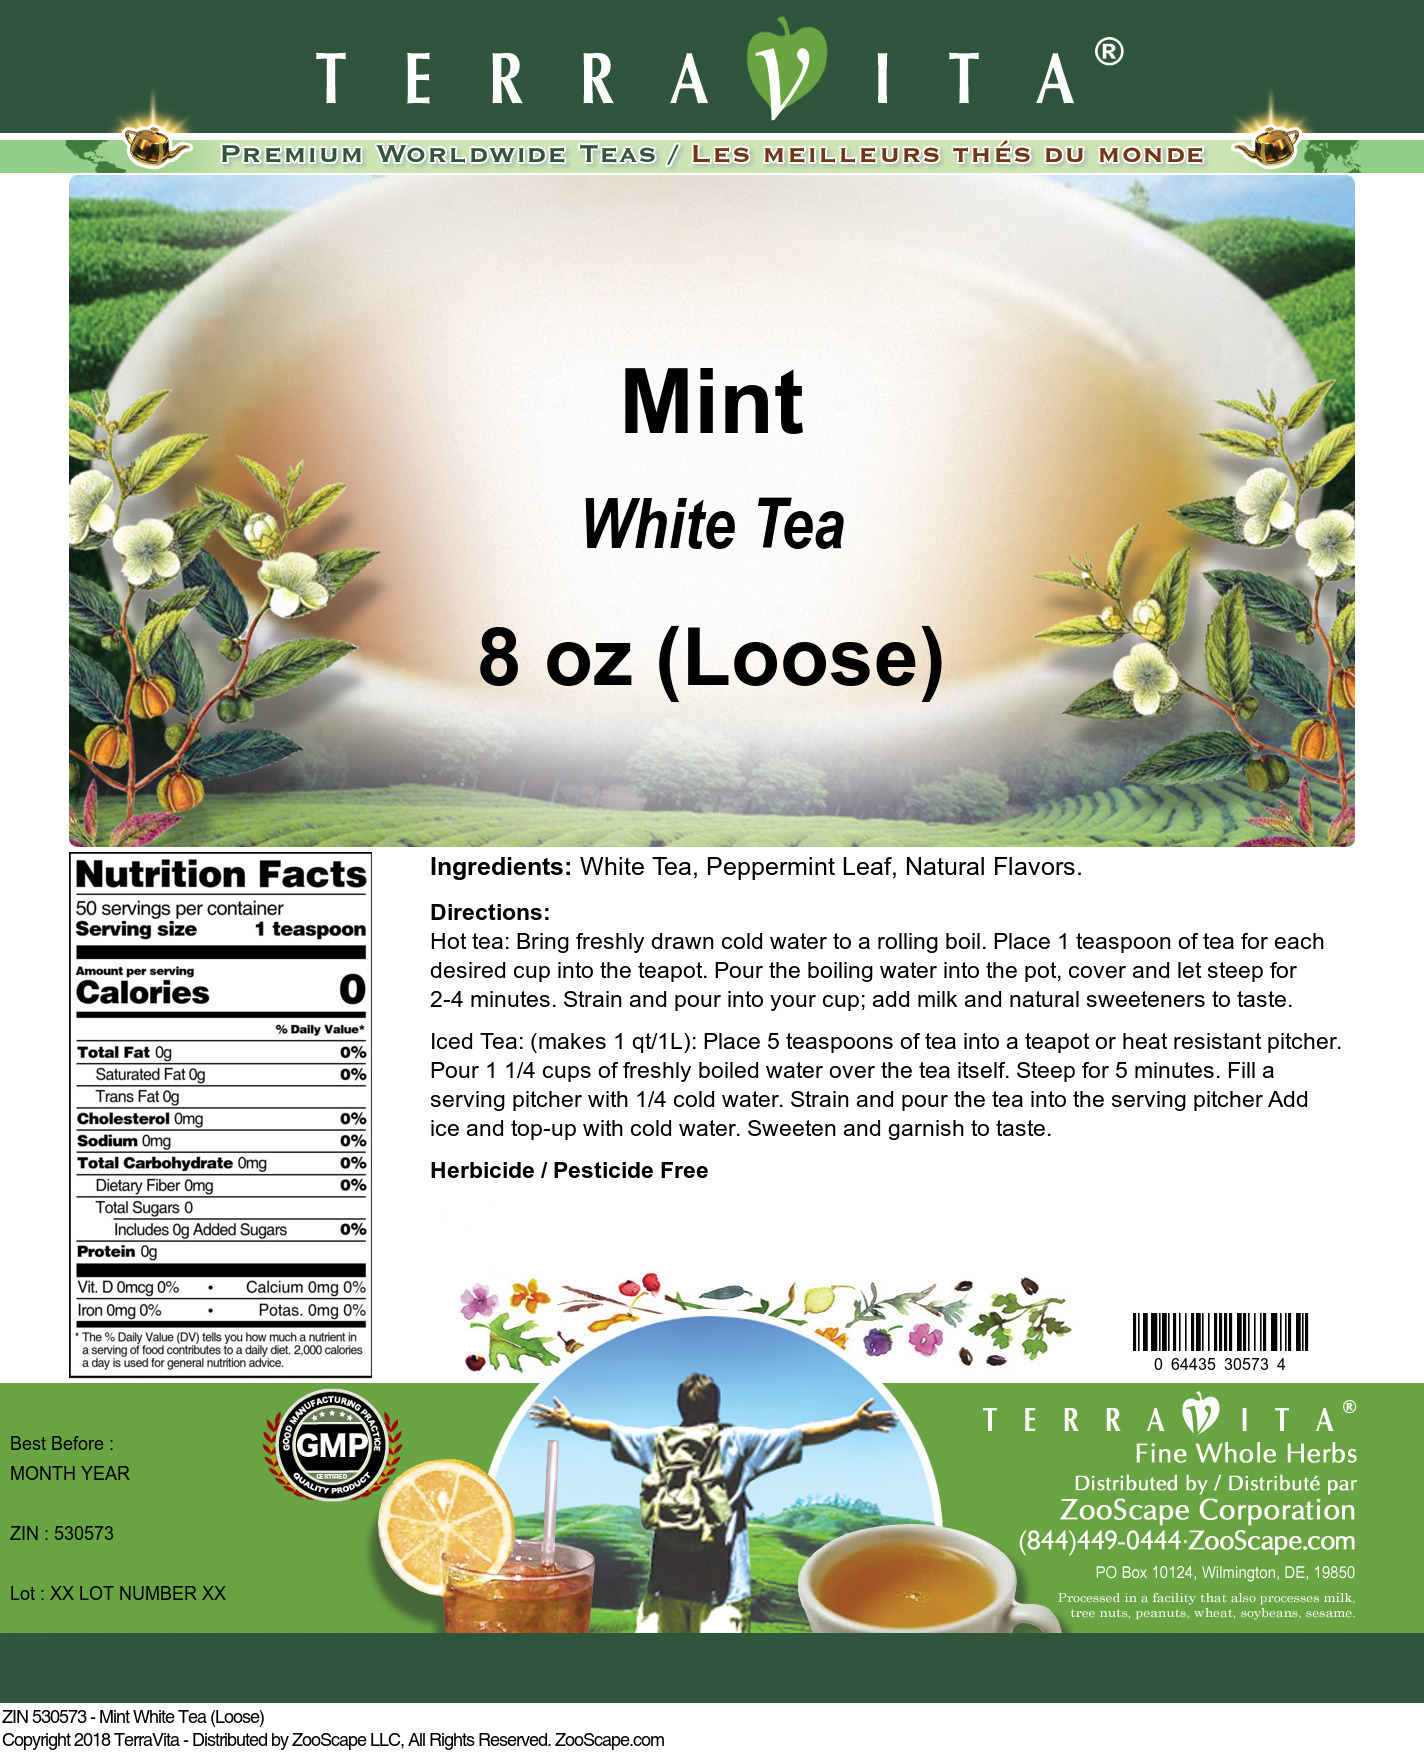 Mint White Tea (Loose)